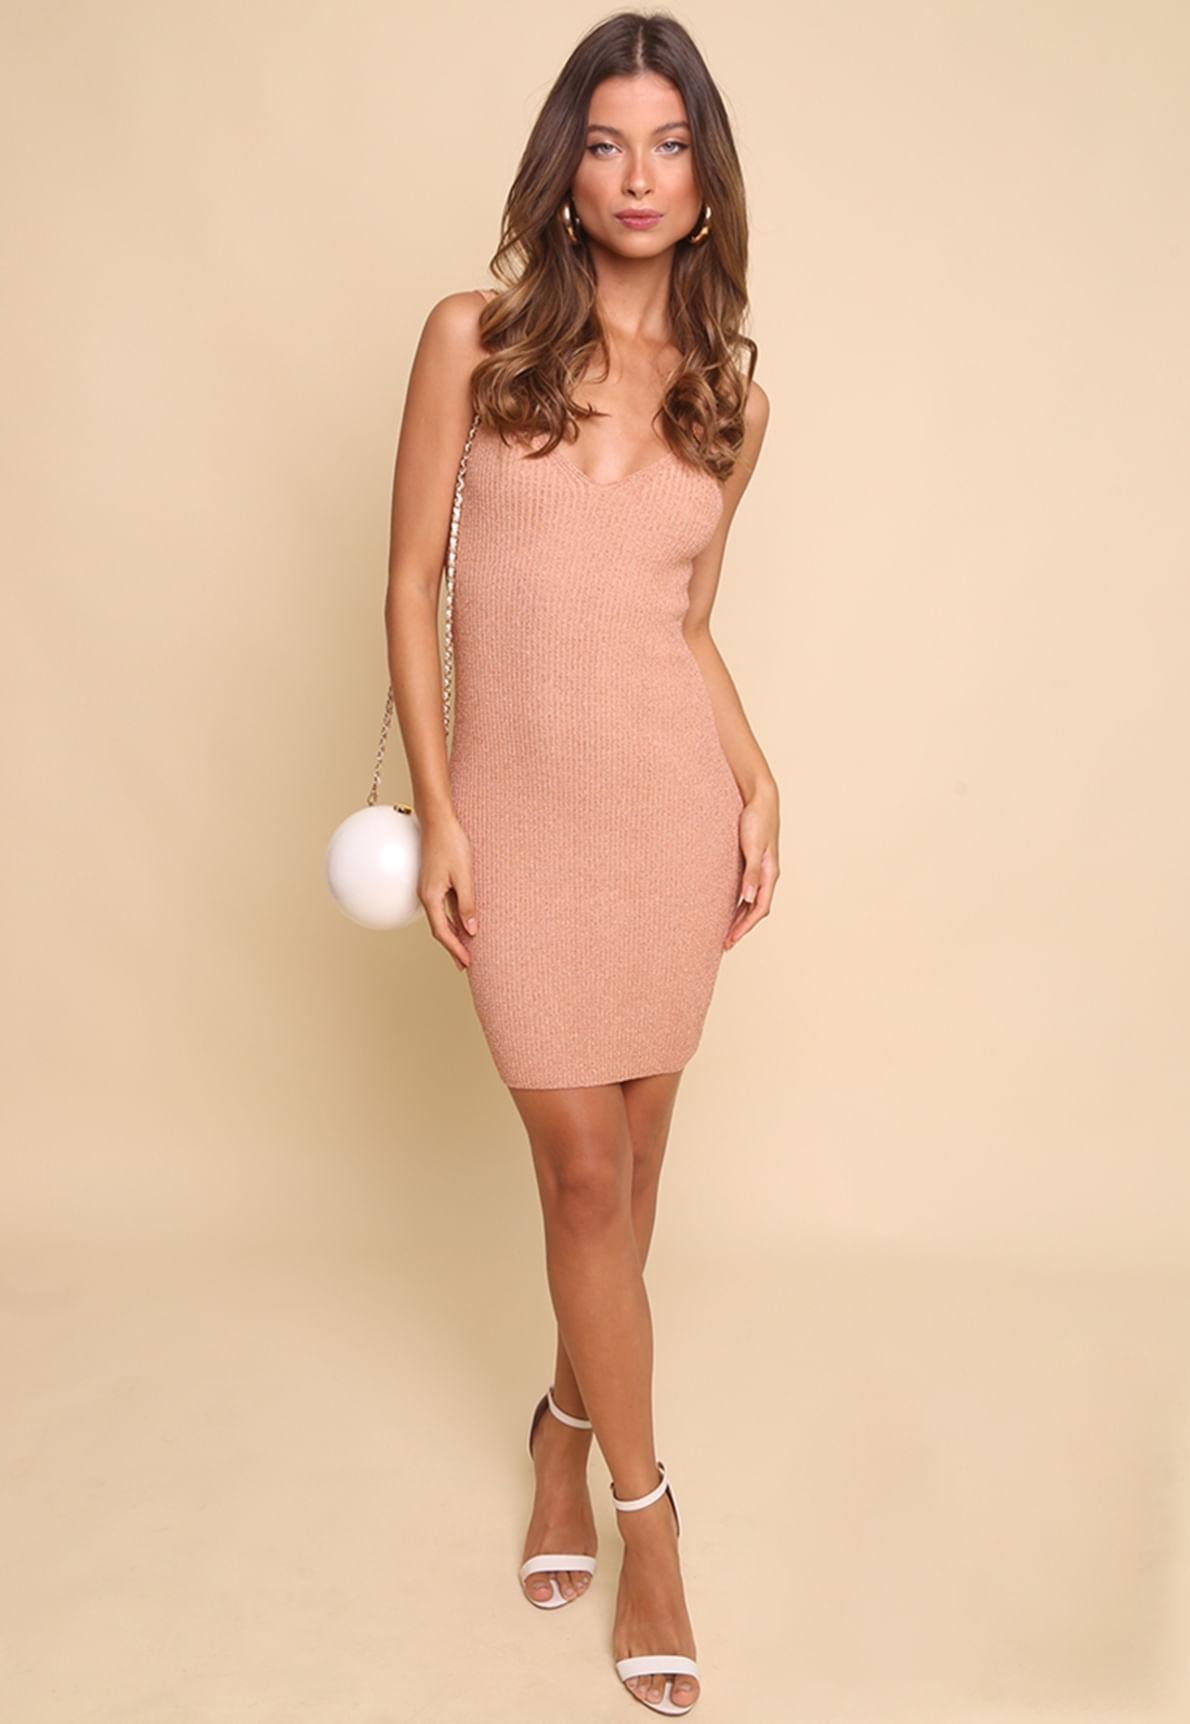 27747-vestido-rose-trico-giordana-mundo-lolita-03